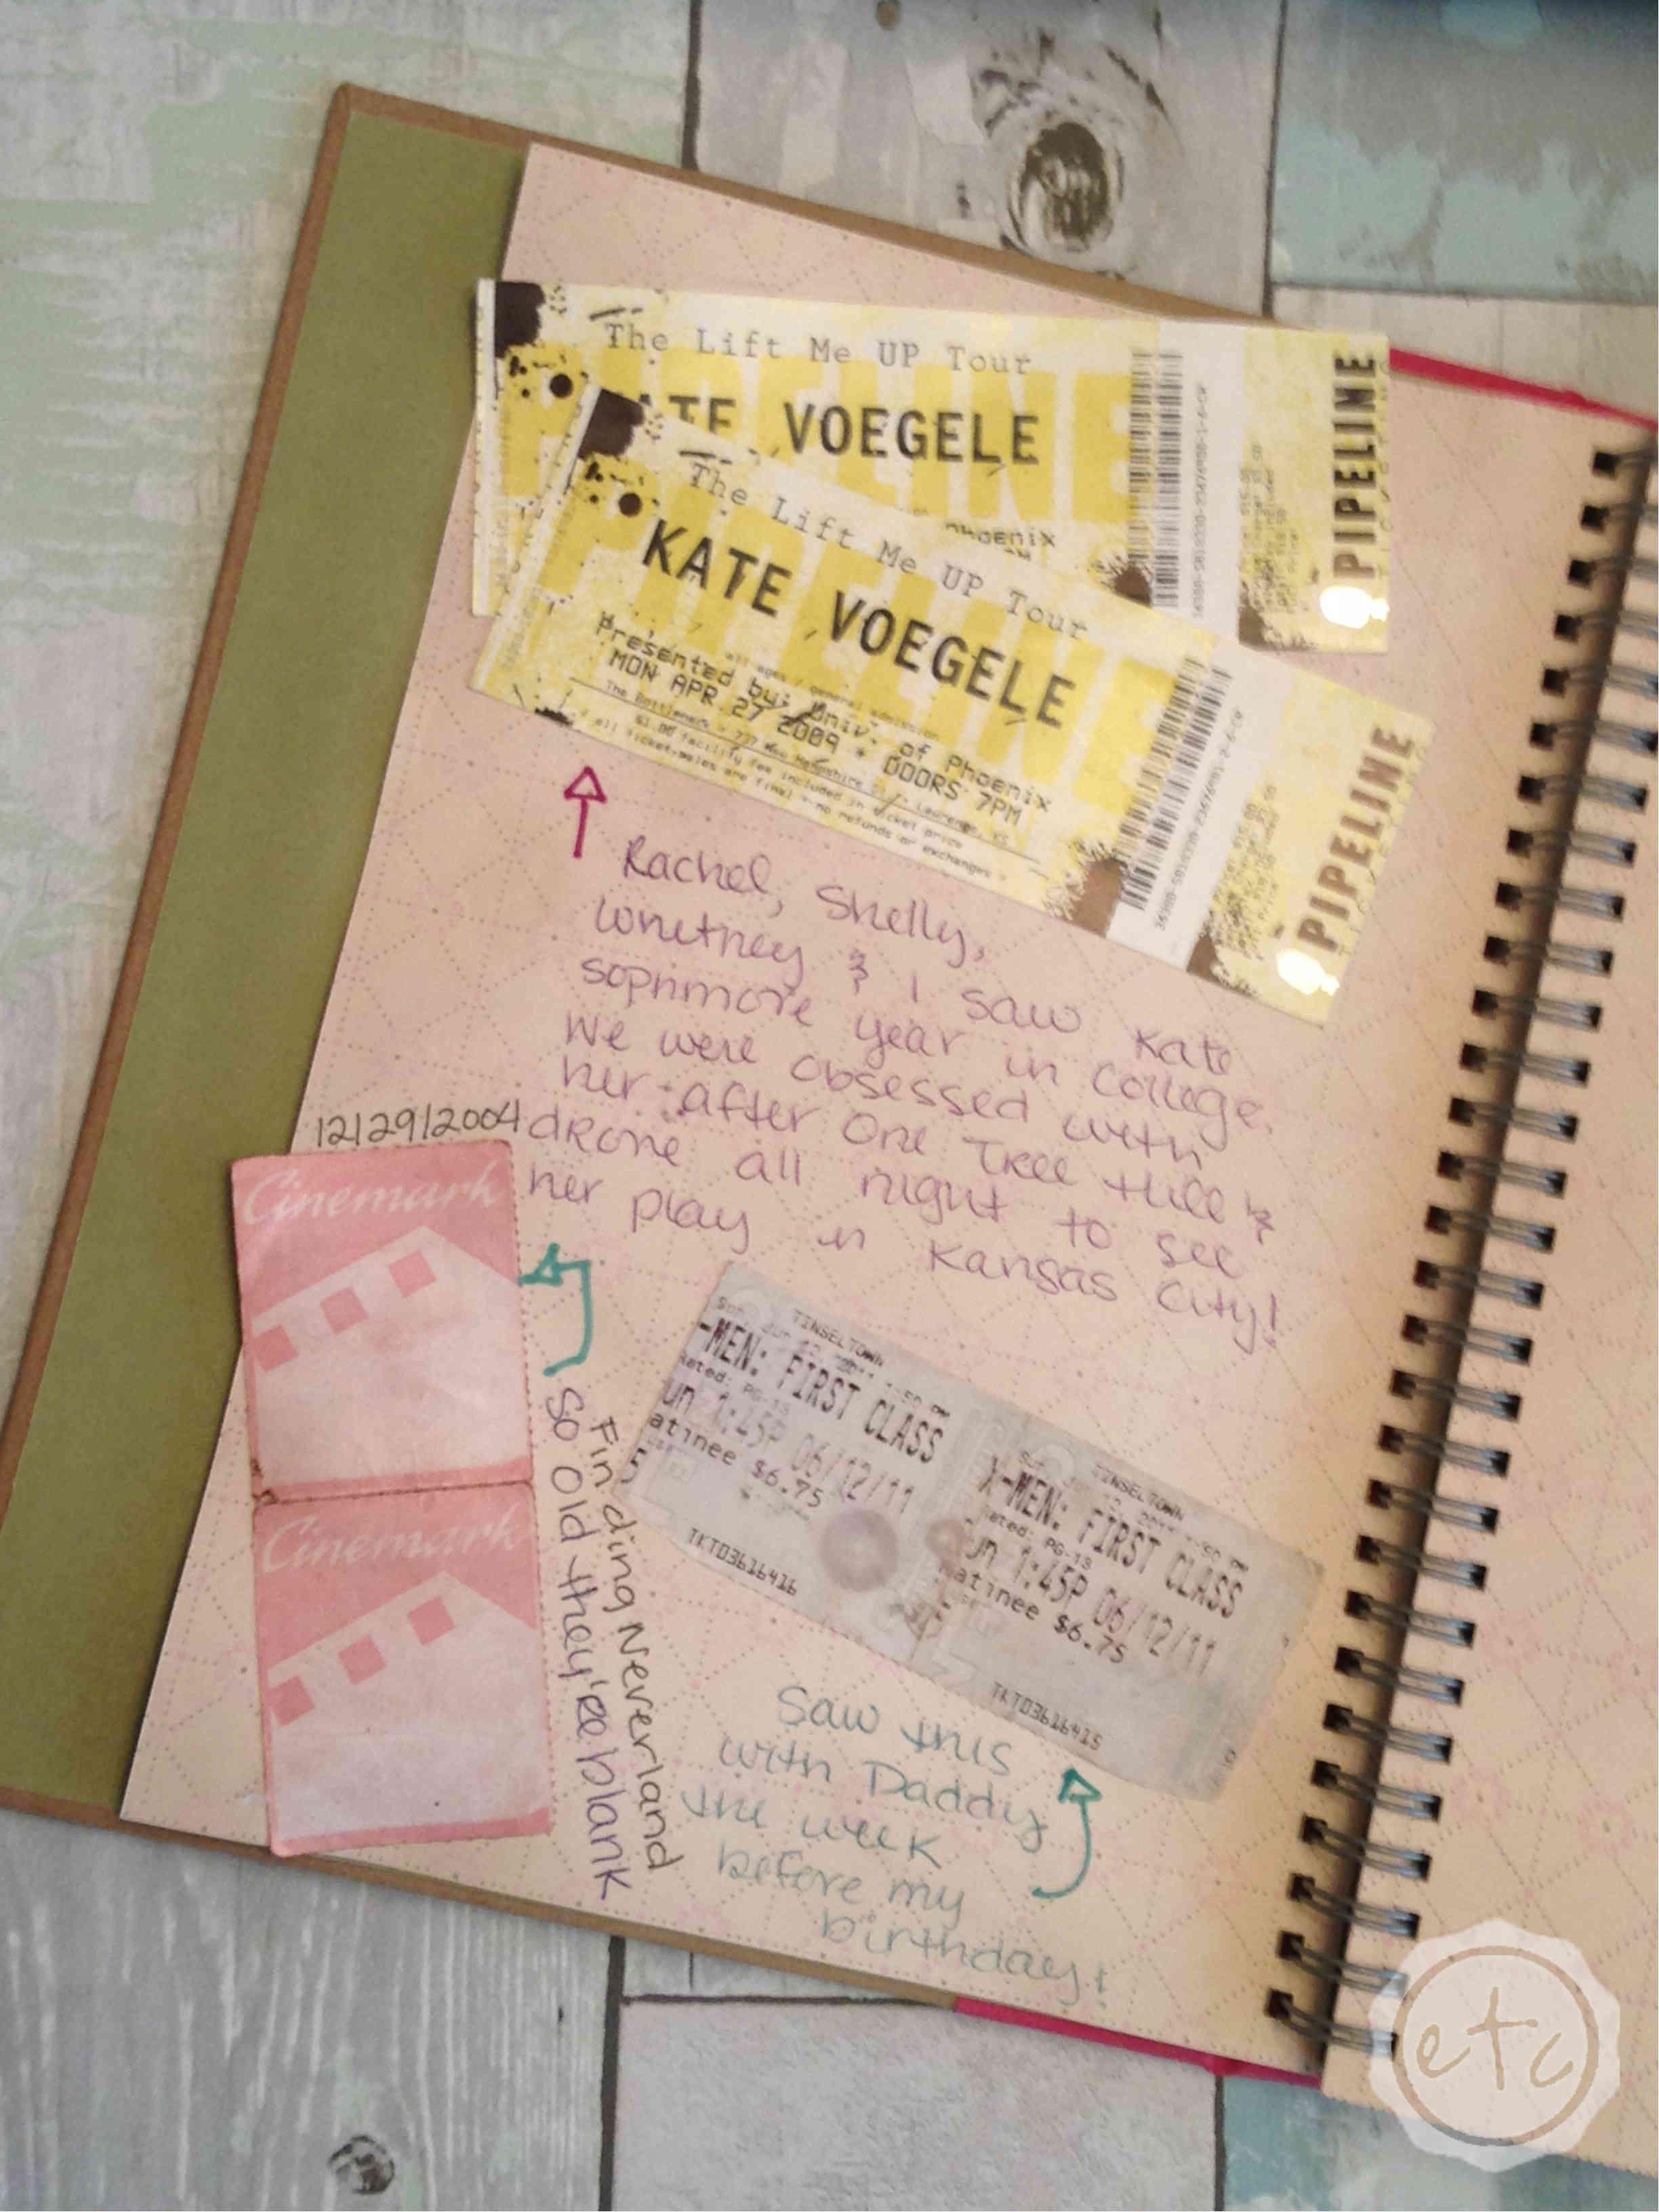 saving memories ticket stubs other memorabilia happily ever after etc